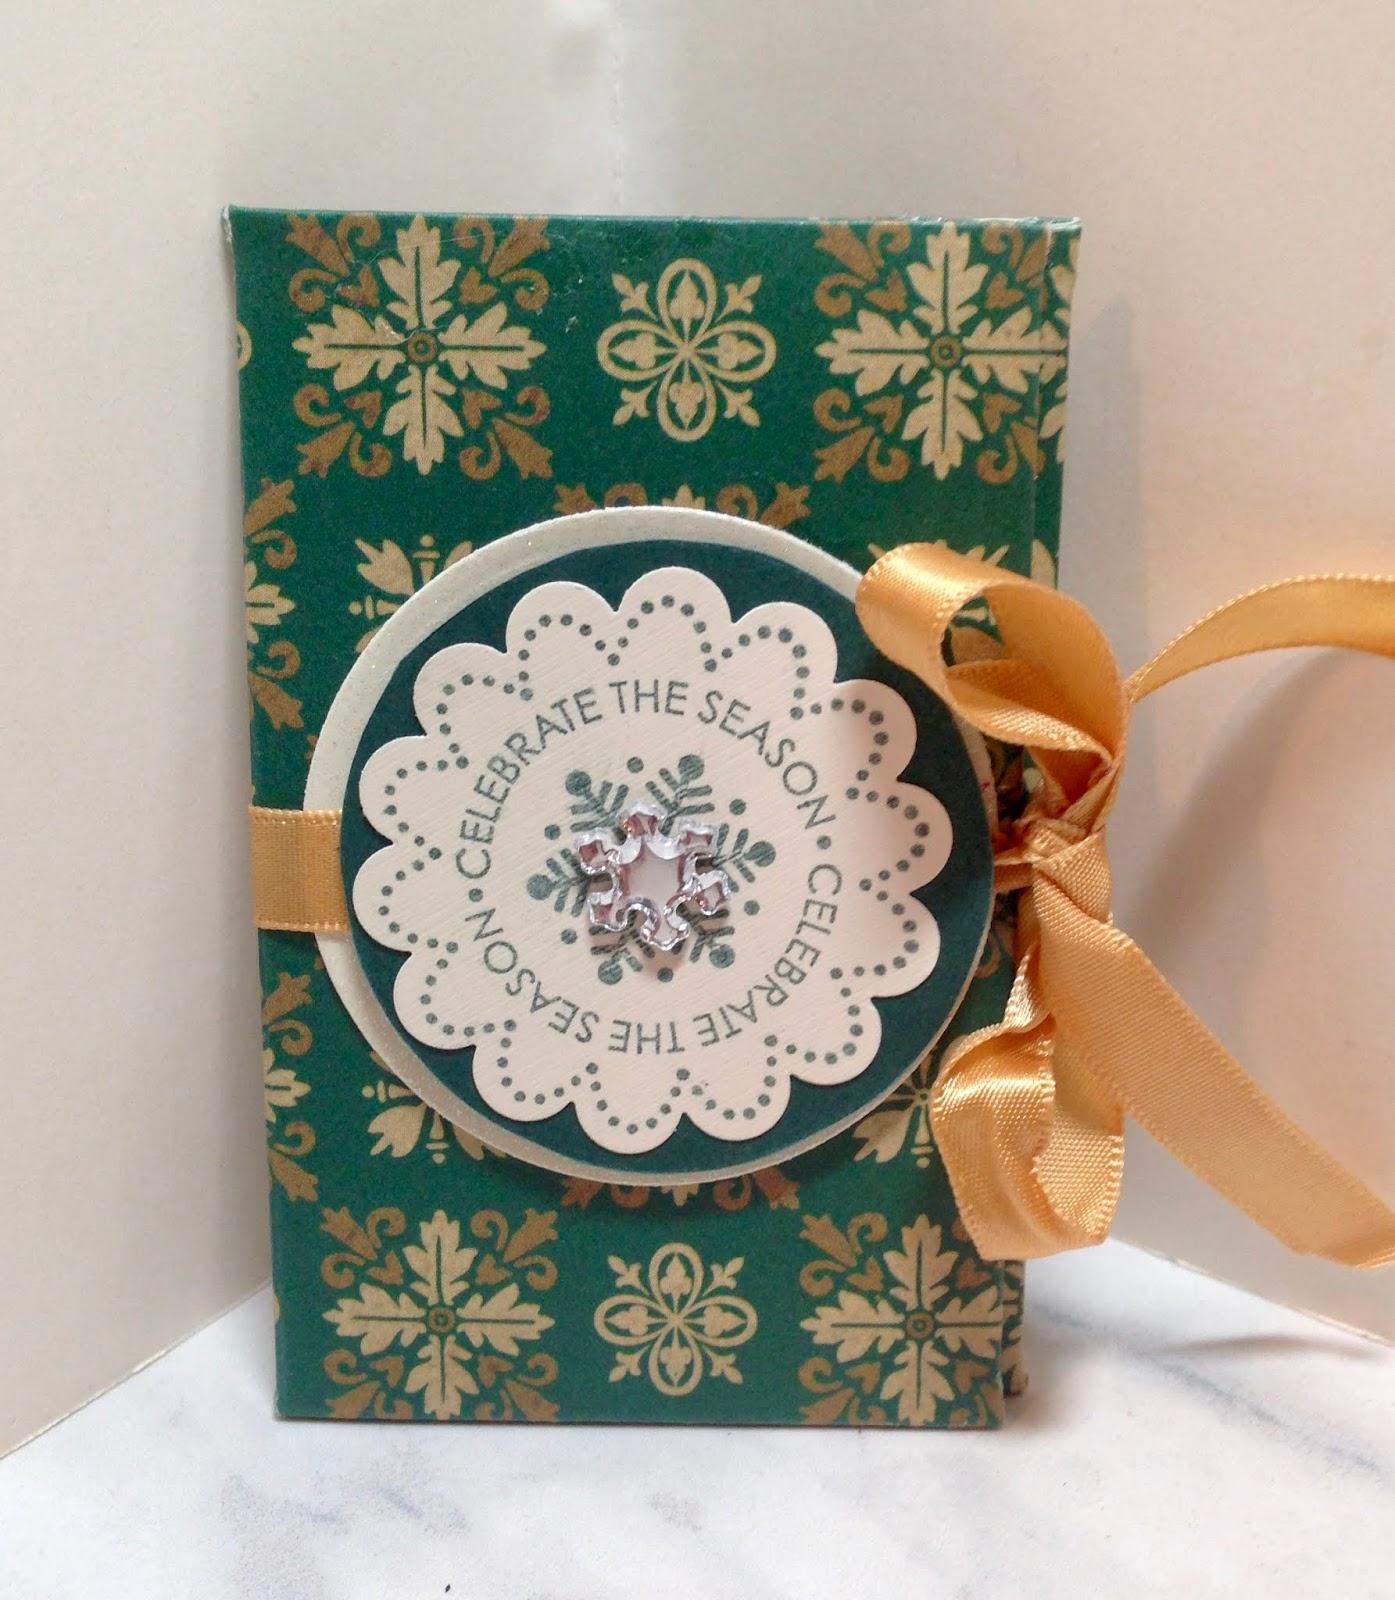 Amy S Creative Pursuits A Handmade Gift Card Holder